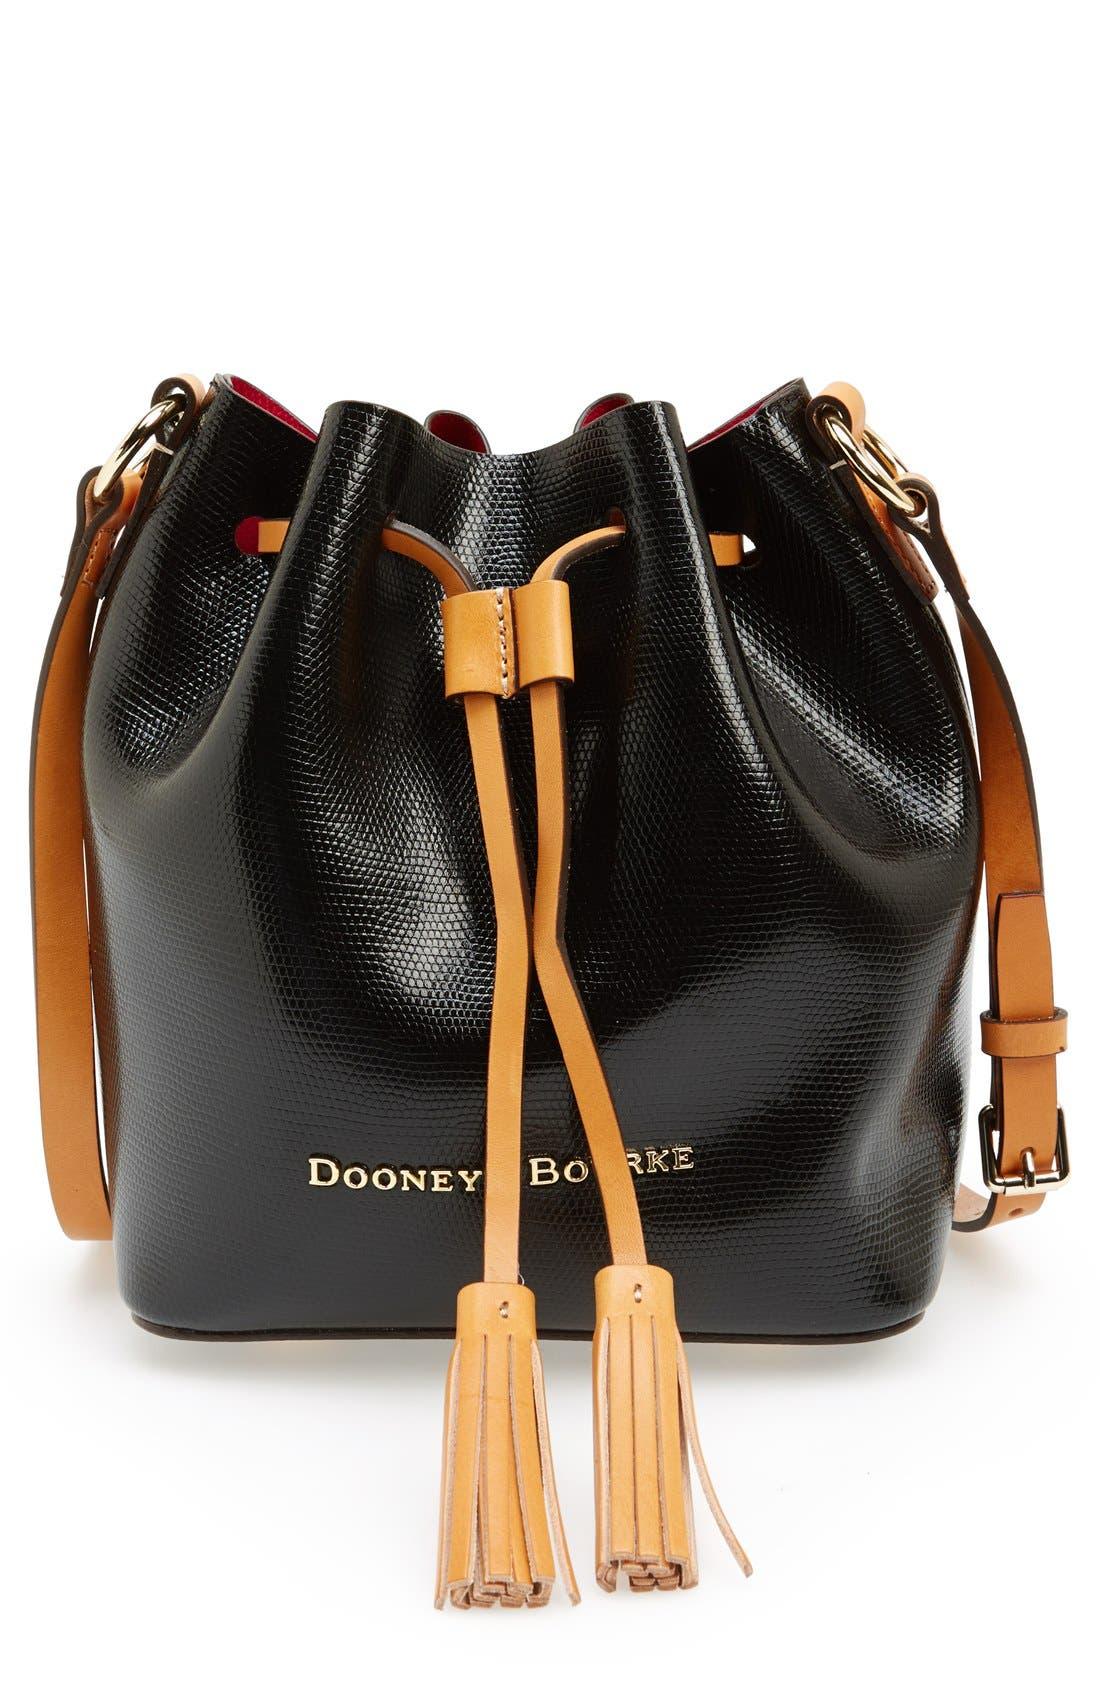 Alternate Image 1 Selected - Dooney & Bourke 'Serena' Embossed Leather Crossbody Bag